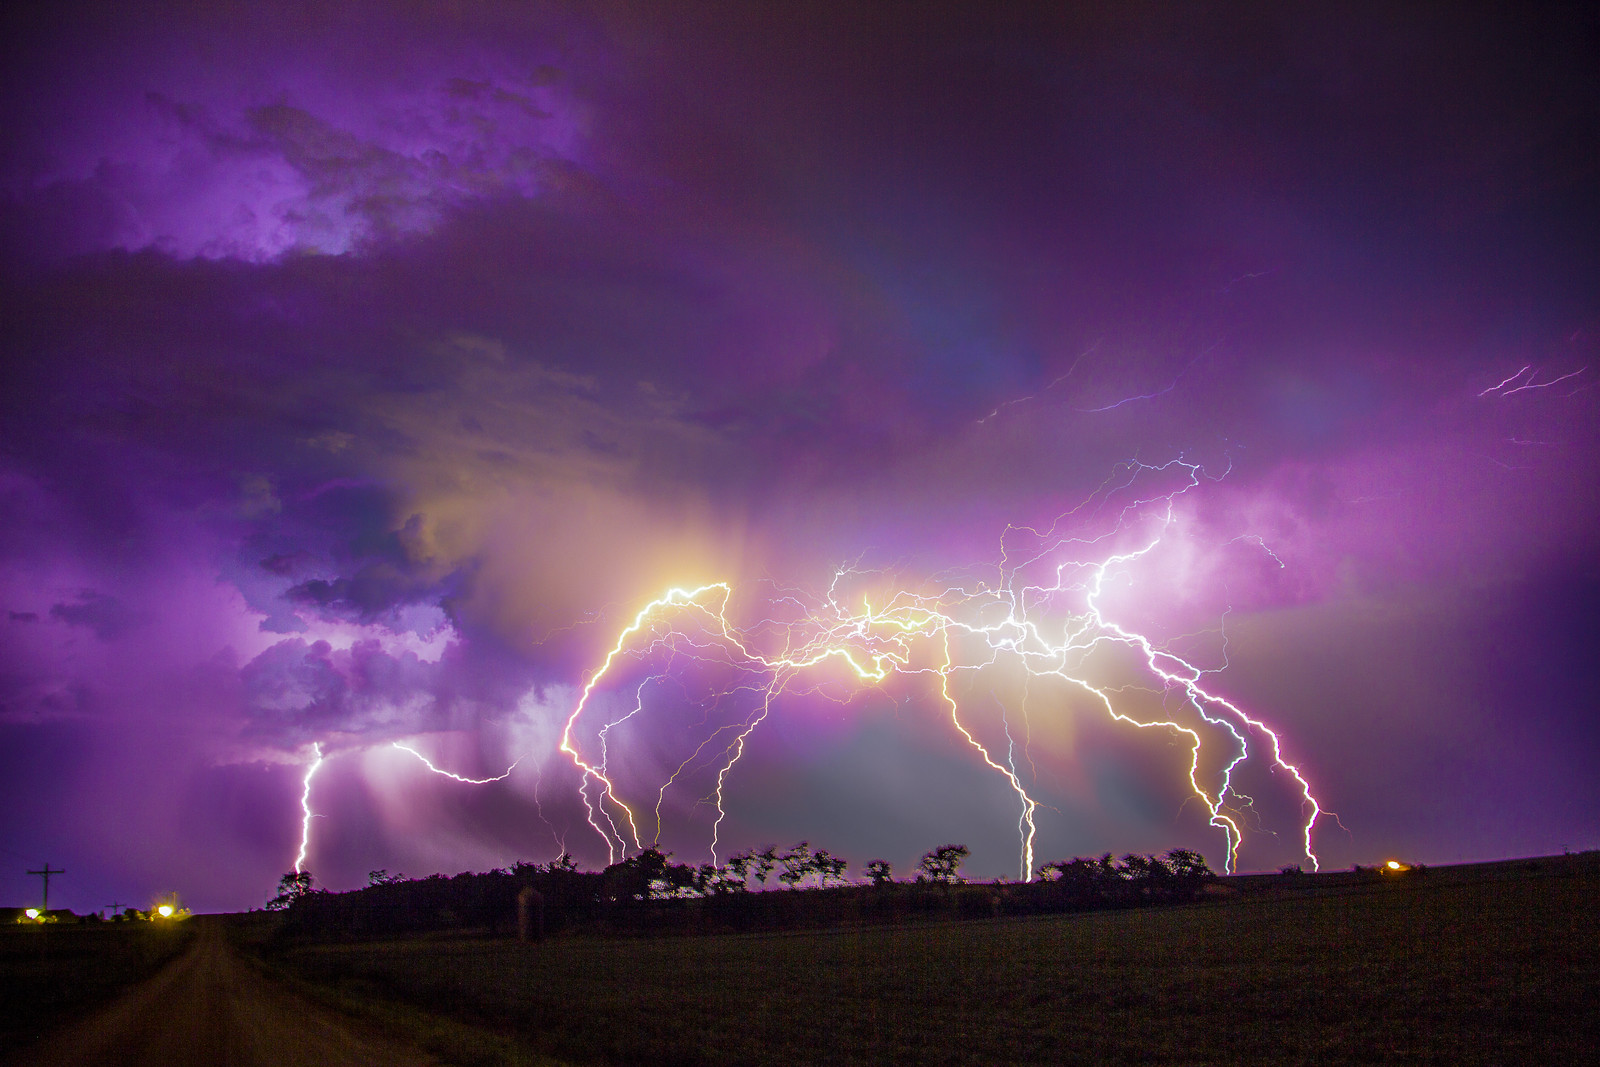 081615 - Kewl Nebraska CG Lightning & Krawlers (Stacked)